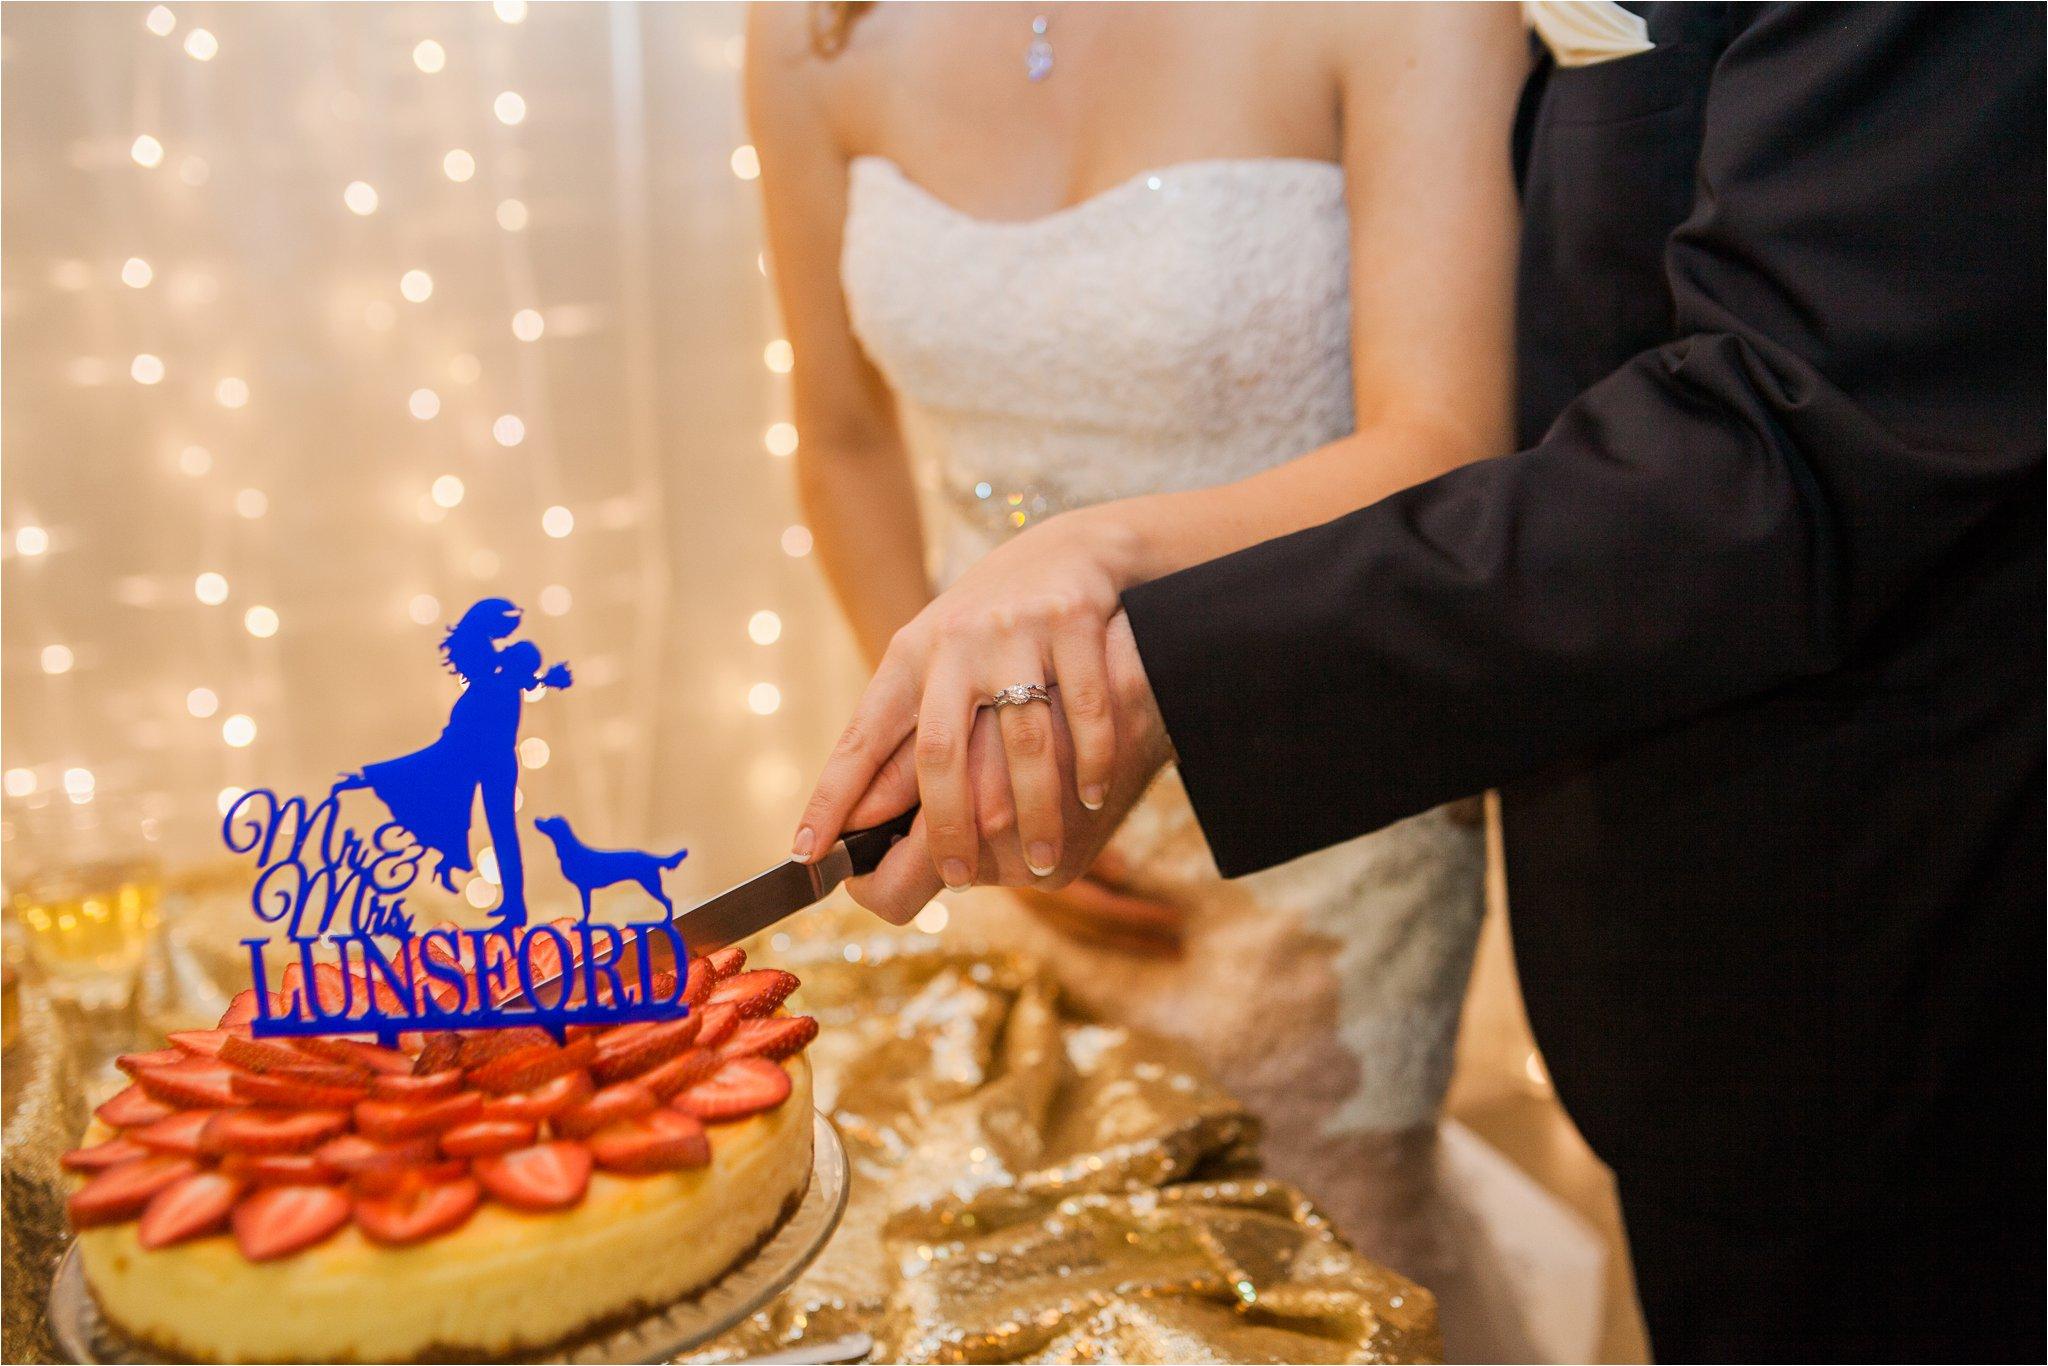 lunsford-wedding-891.jpg